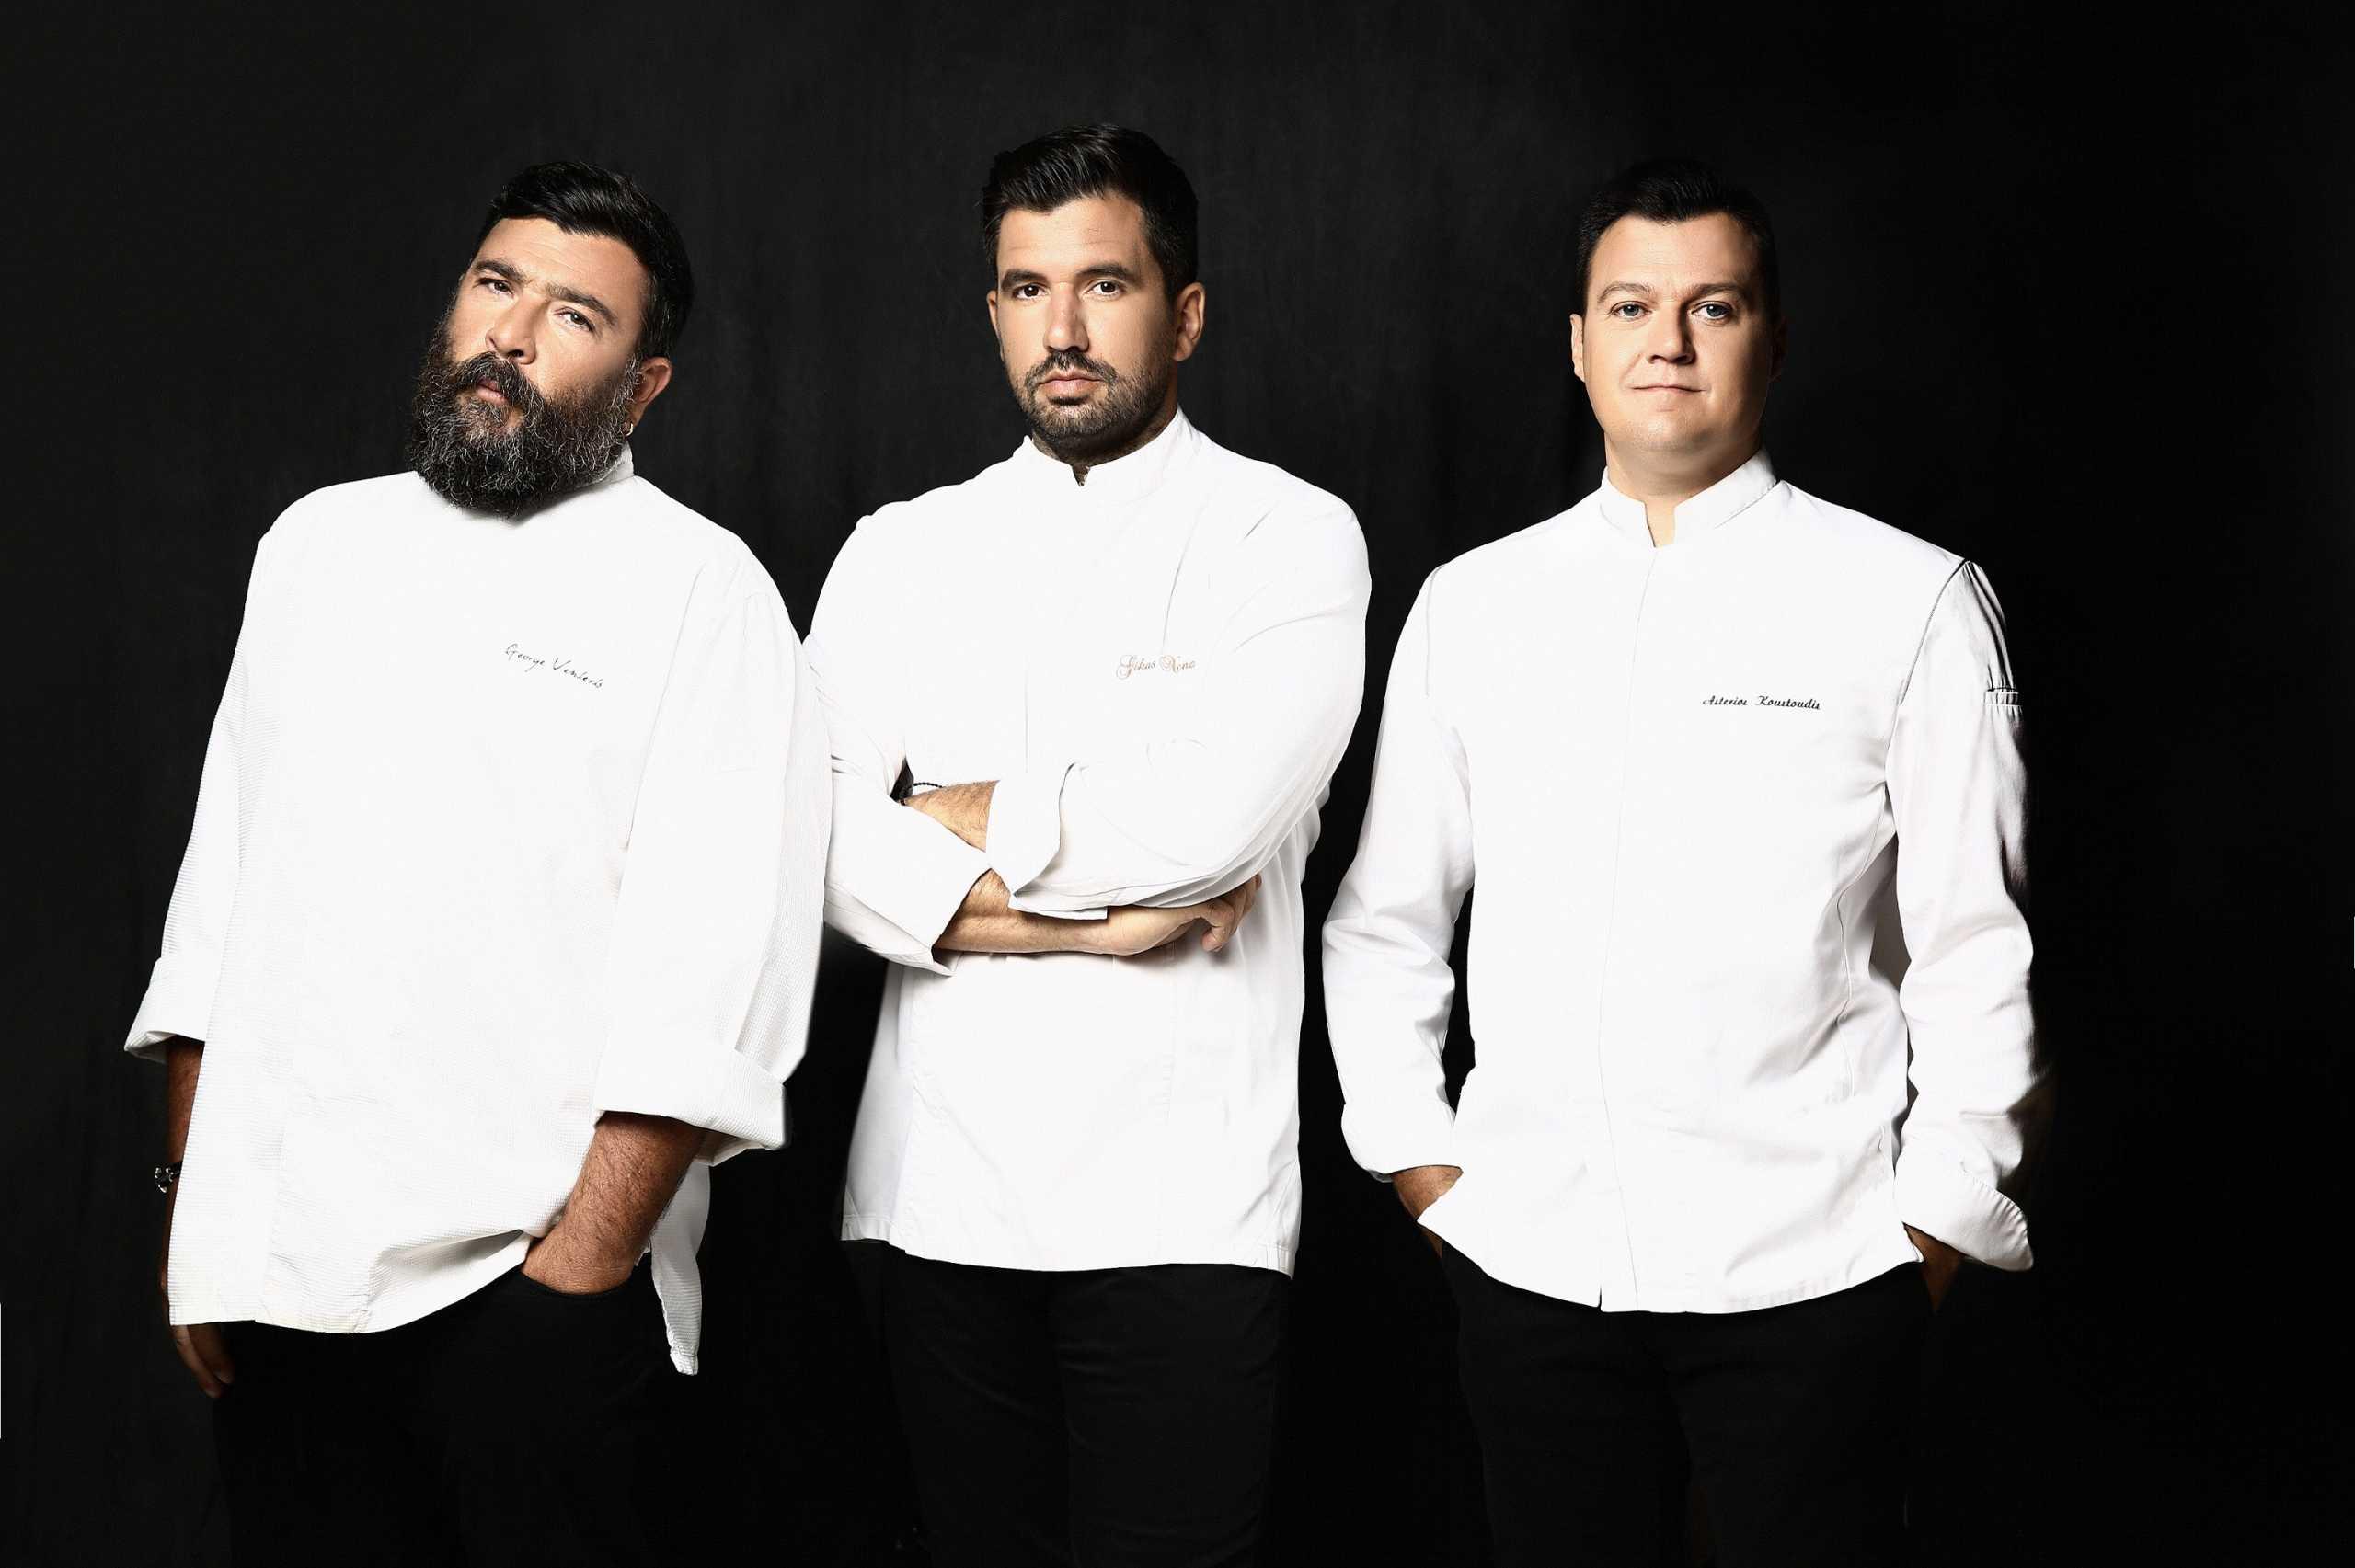 Top Chef: Αυτοί είναι οι 15 διαγωνιζόμενοι του σόου μαγειρικής που κάνει απόψε πρεμιέρα